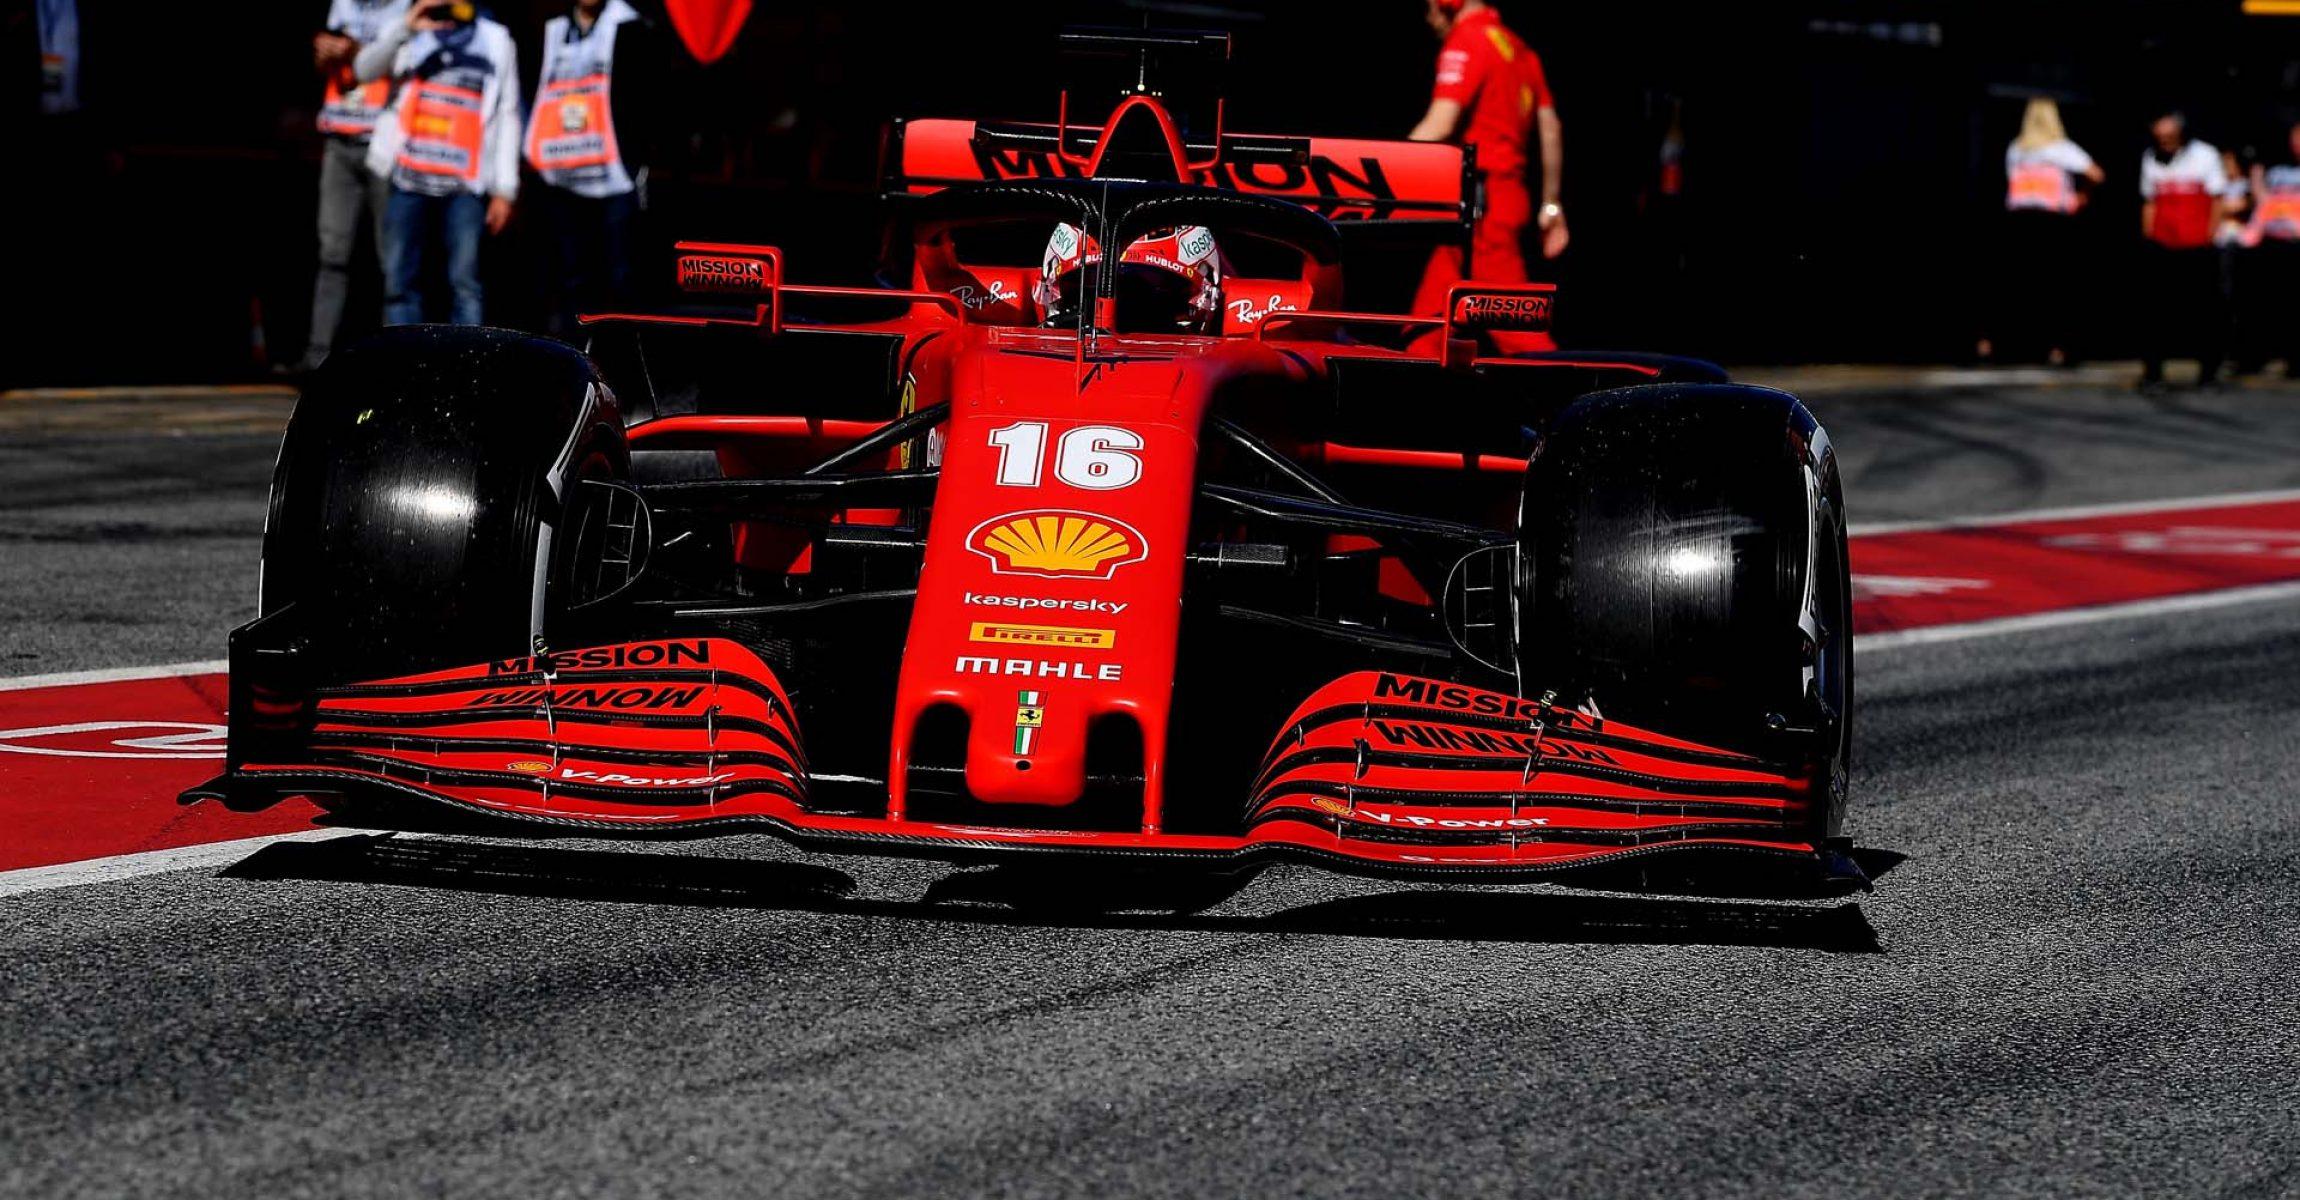 TEST T2 BARCELLONA 2020 - MERCOLEDÌ  26/02/2020 Charles Leclerc Ferrari